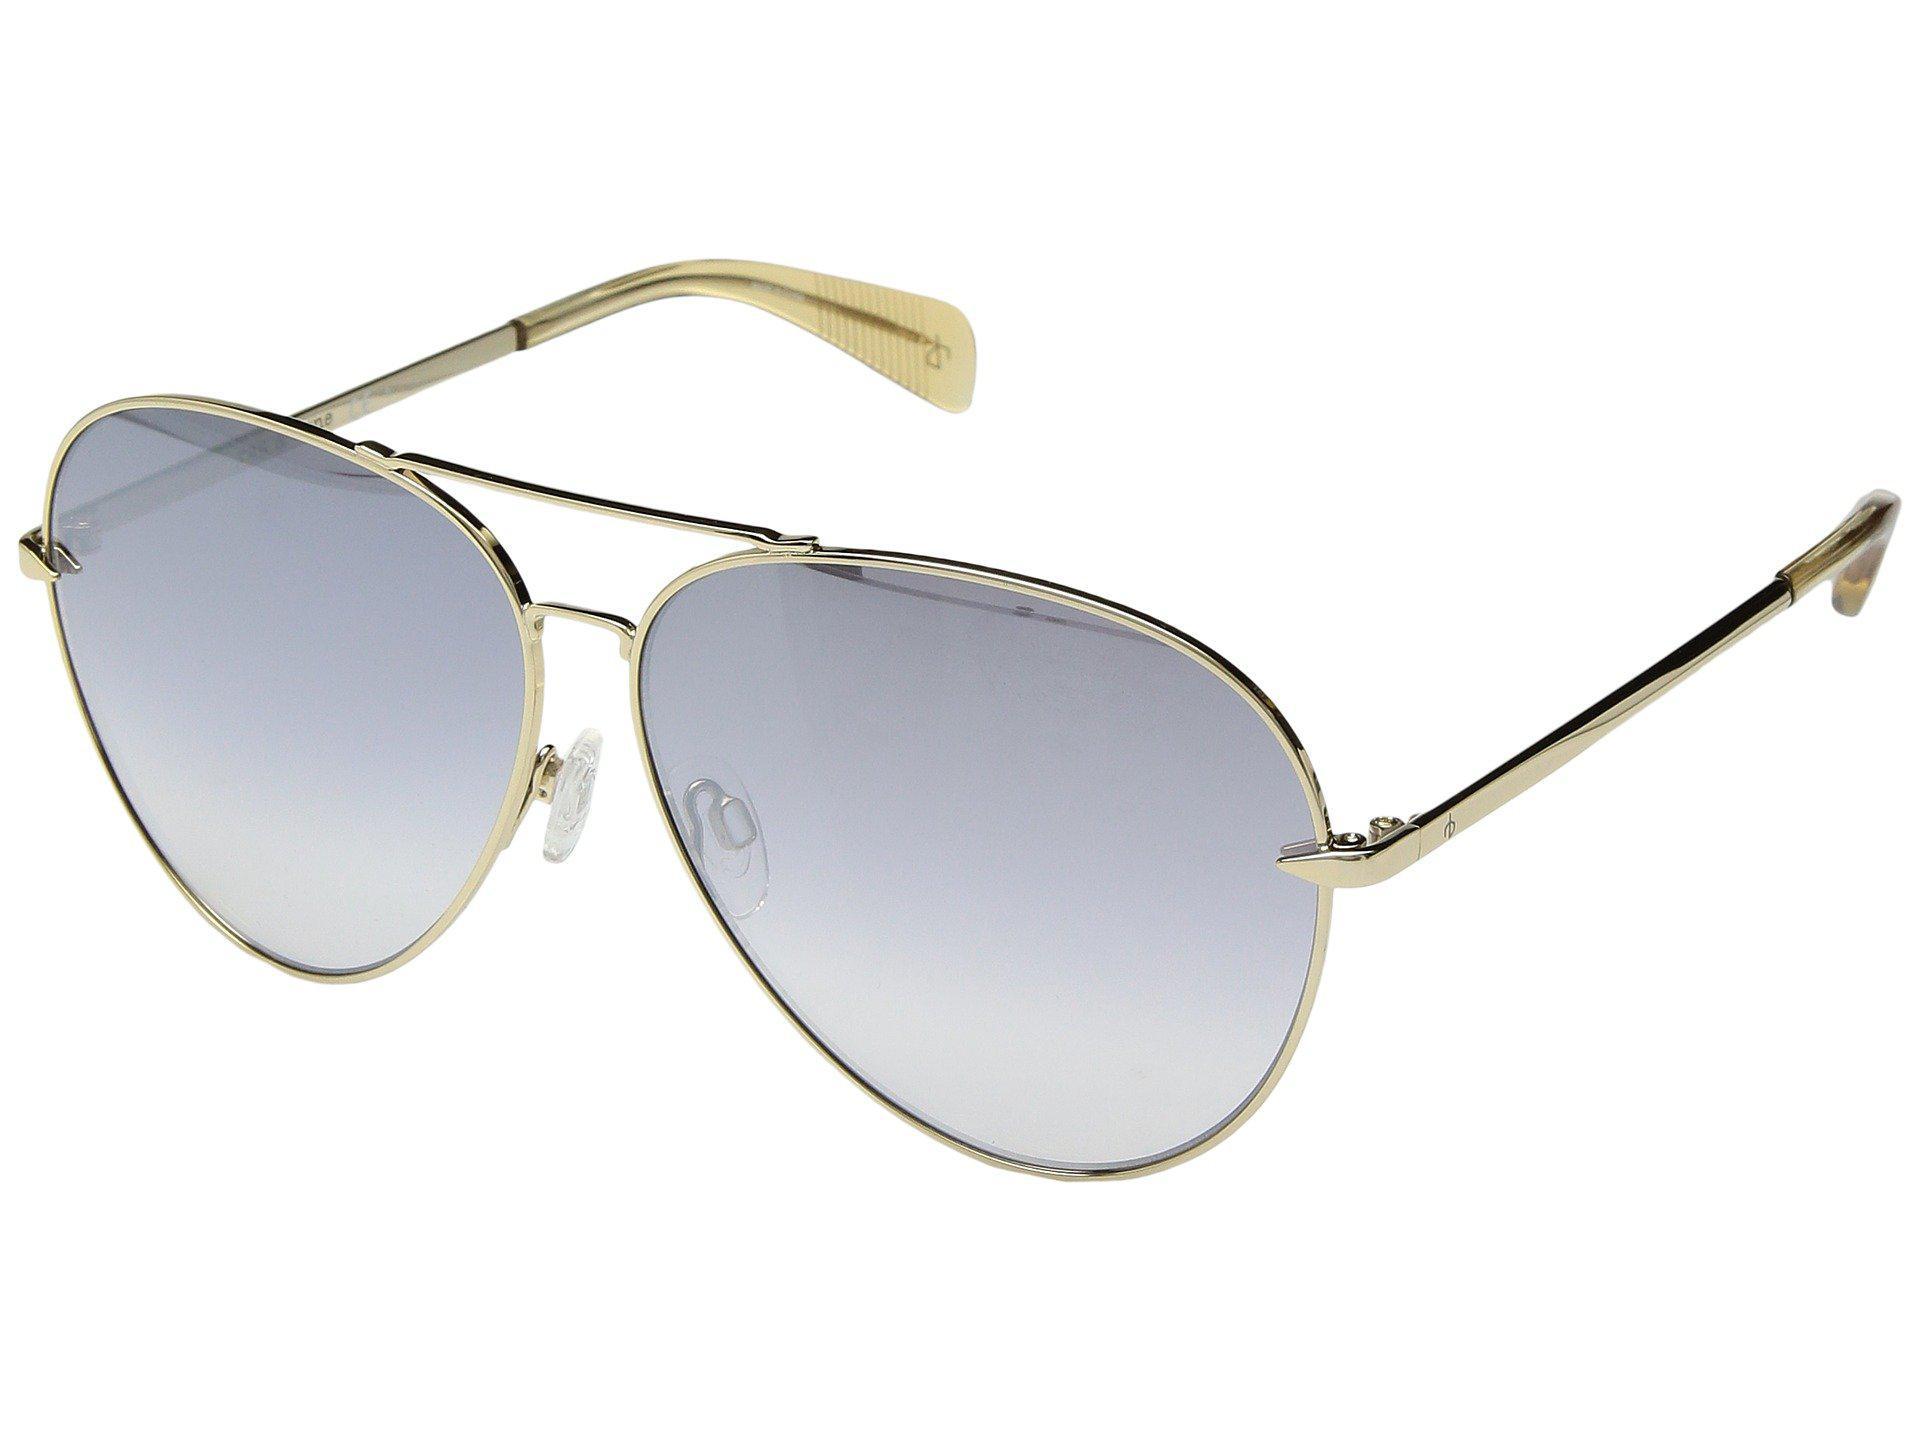 5b8972463a0 Rag   Bone. Women s Metallic Rnb1006 s (palladium silver) Fashion Sunglasses